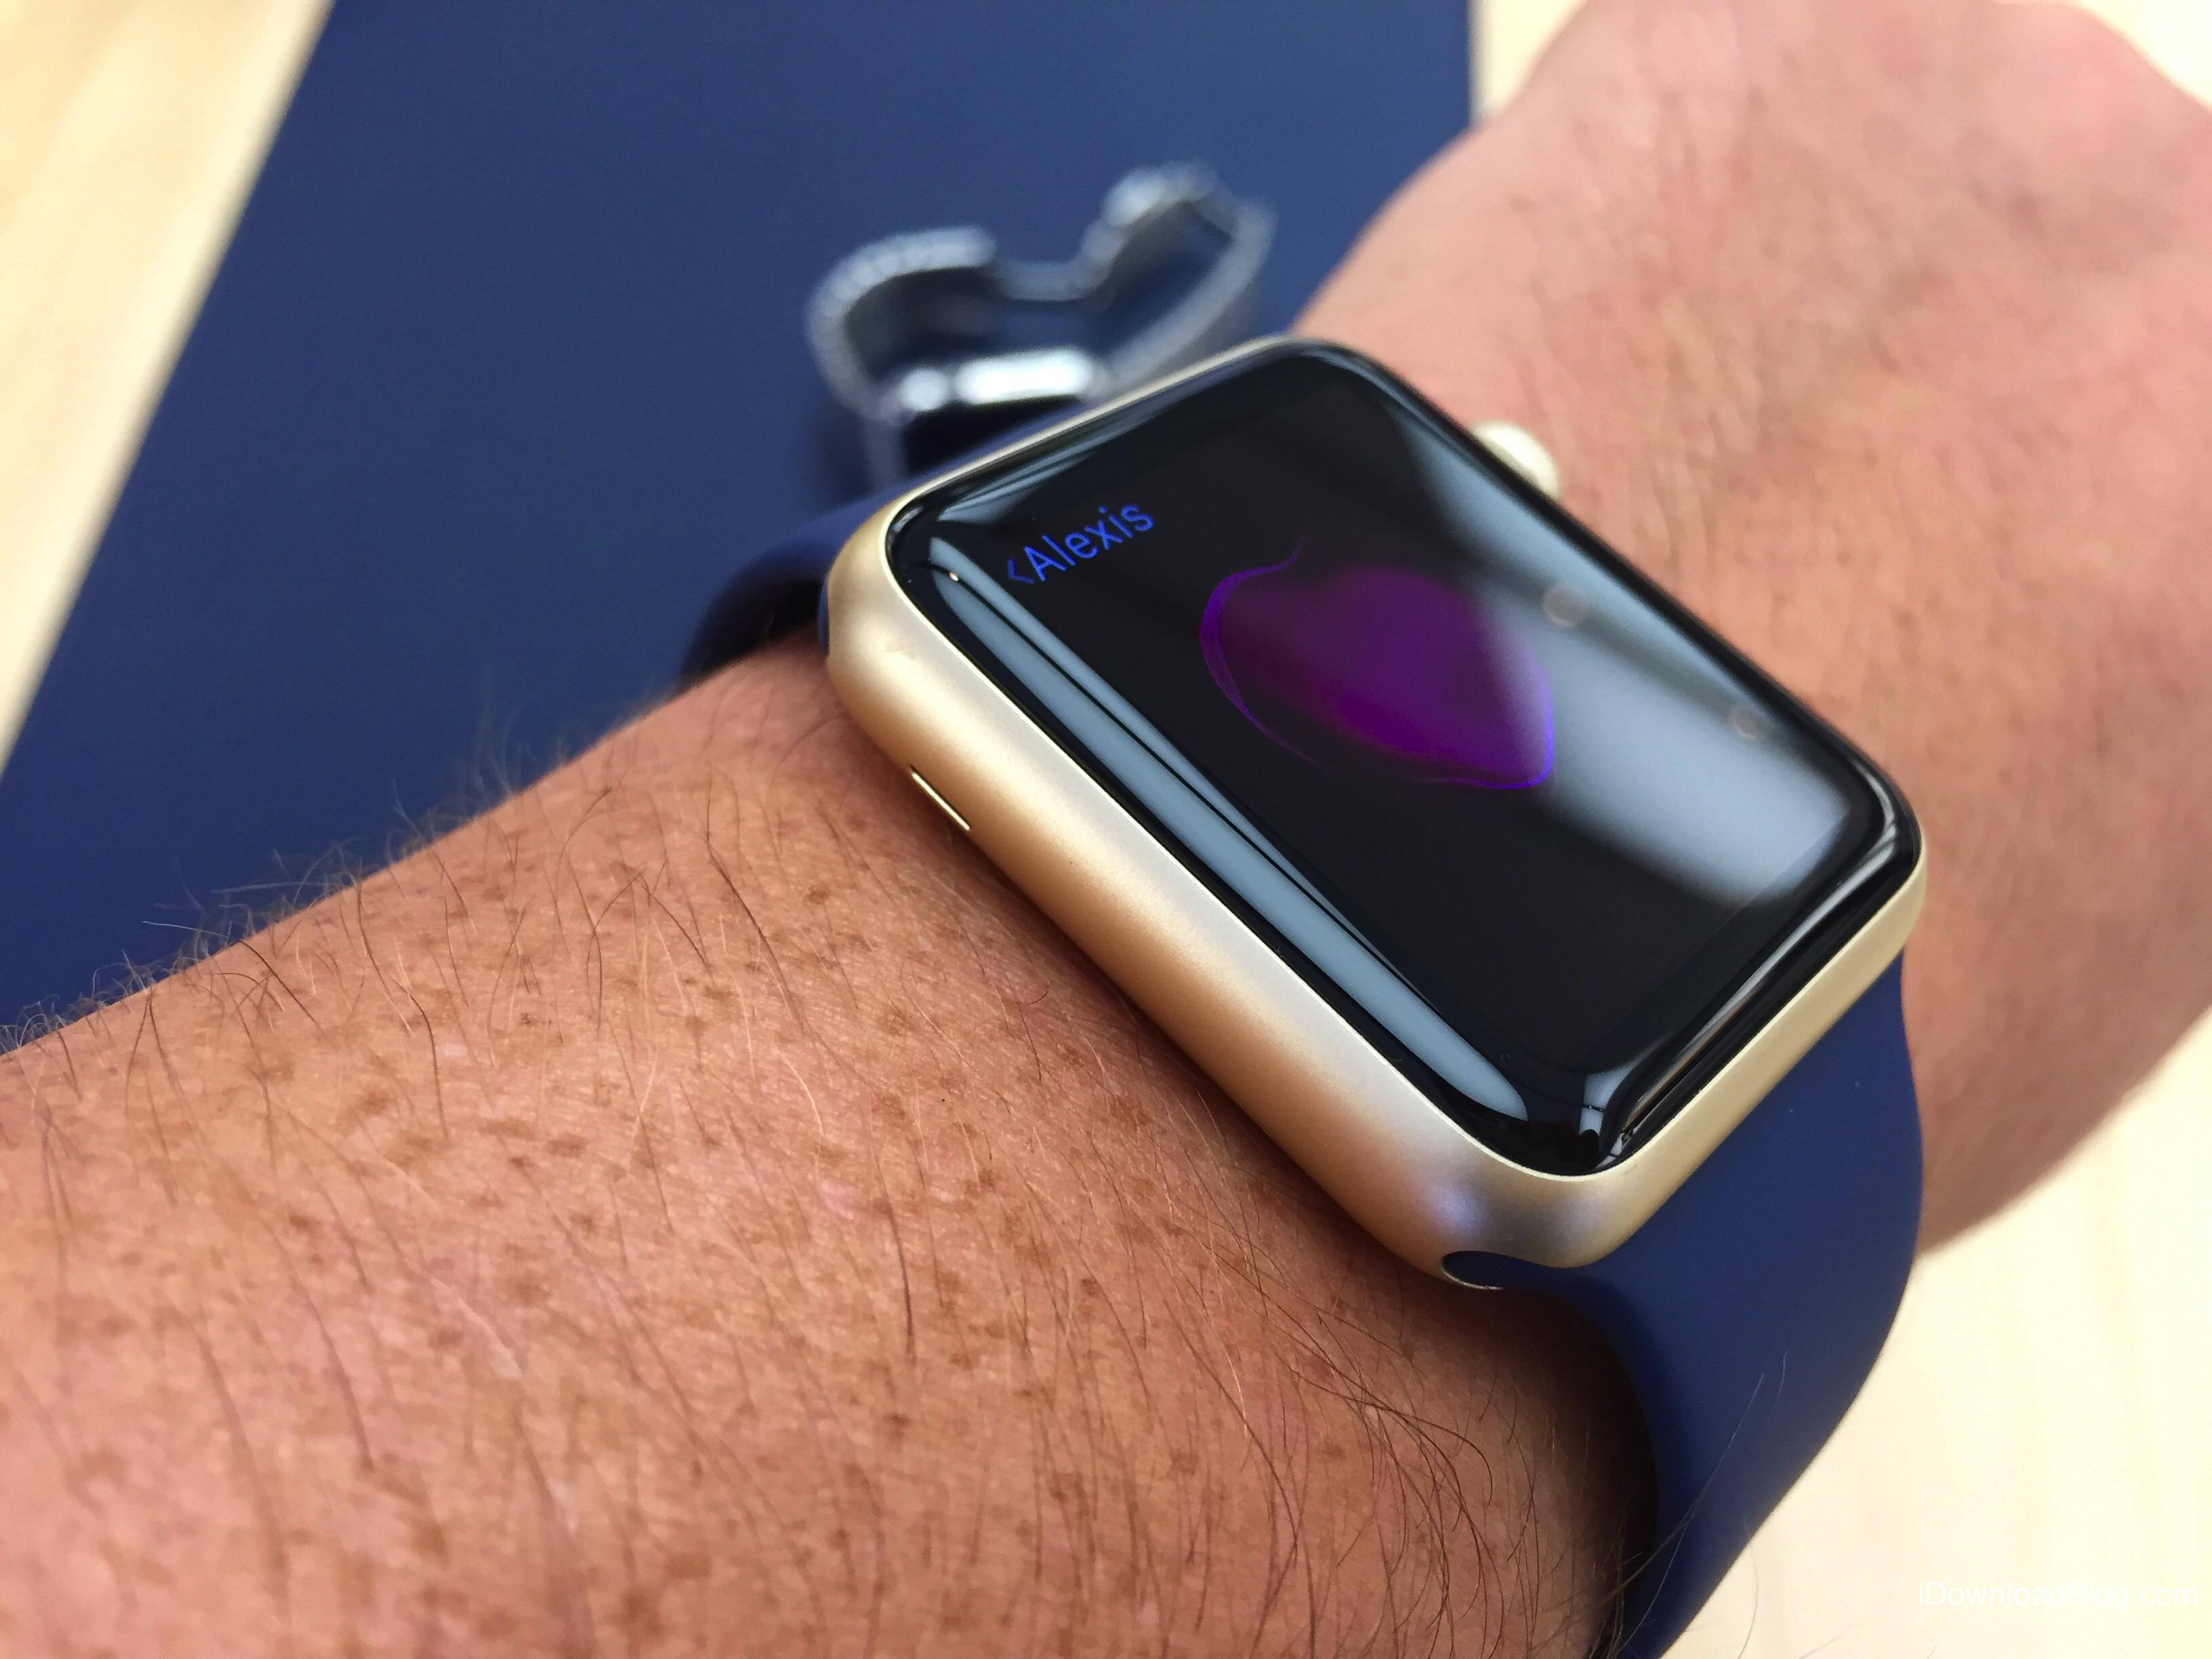 Gold Aluminum Apple Watch Hands on 4